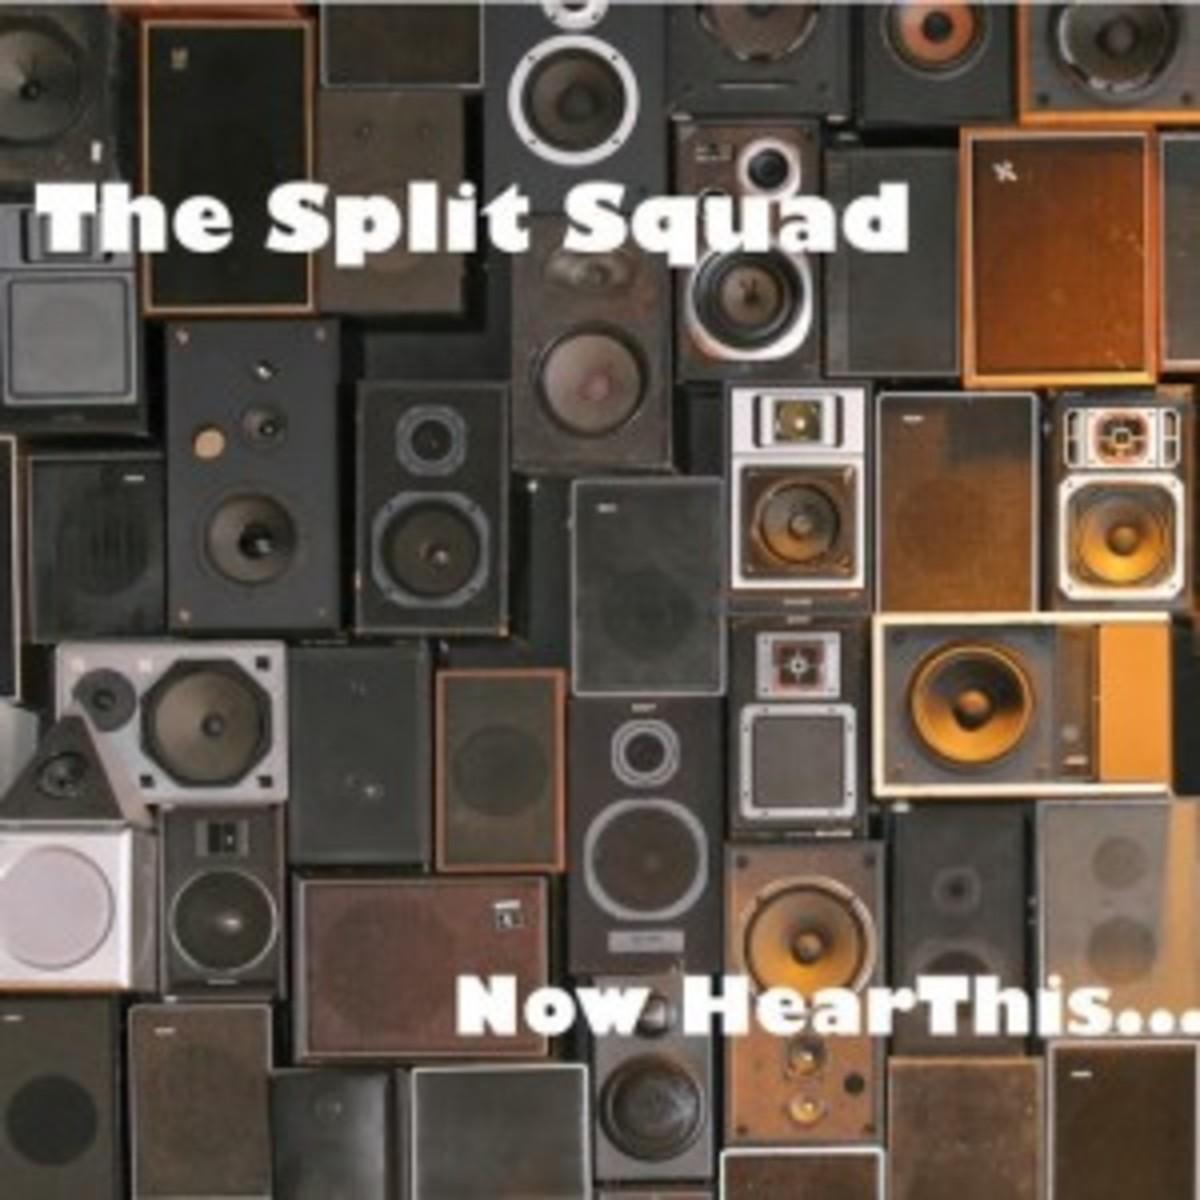 split squad - now hear this